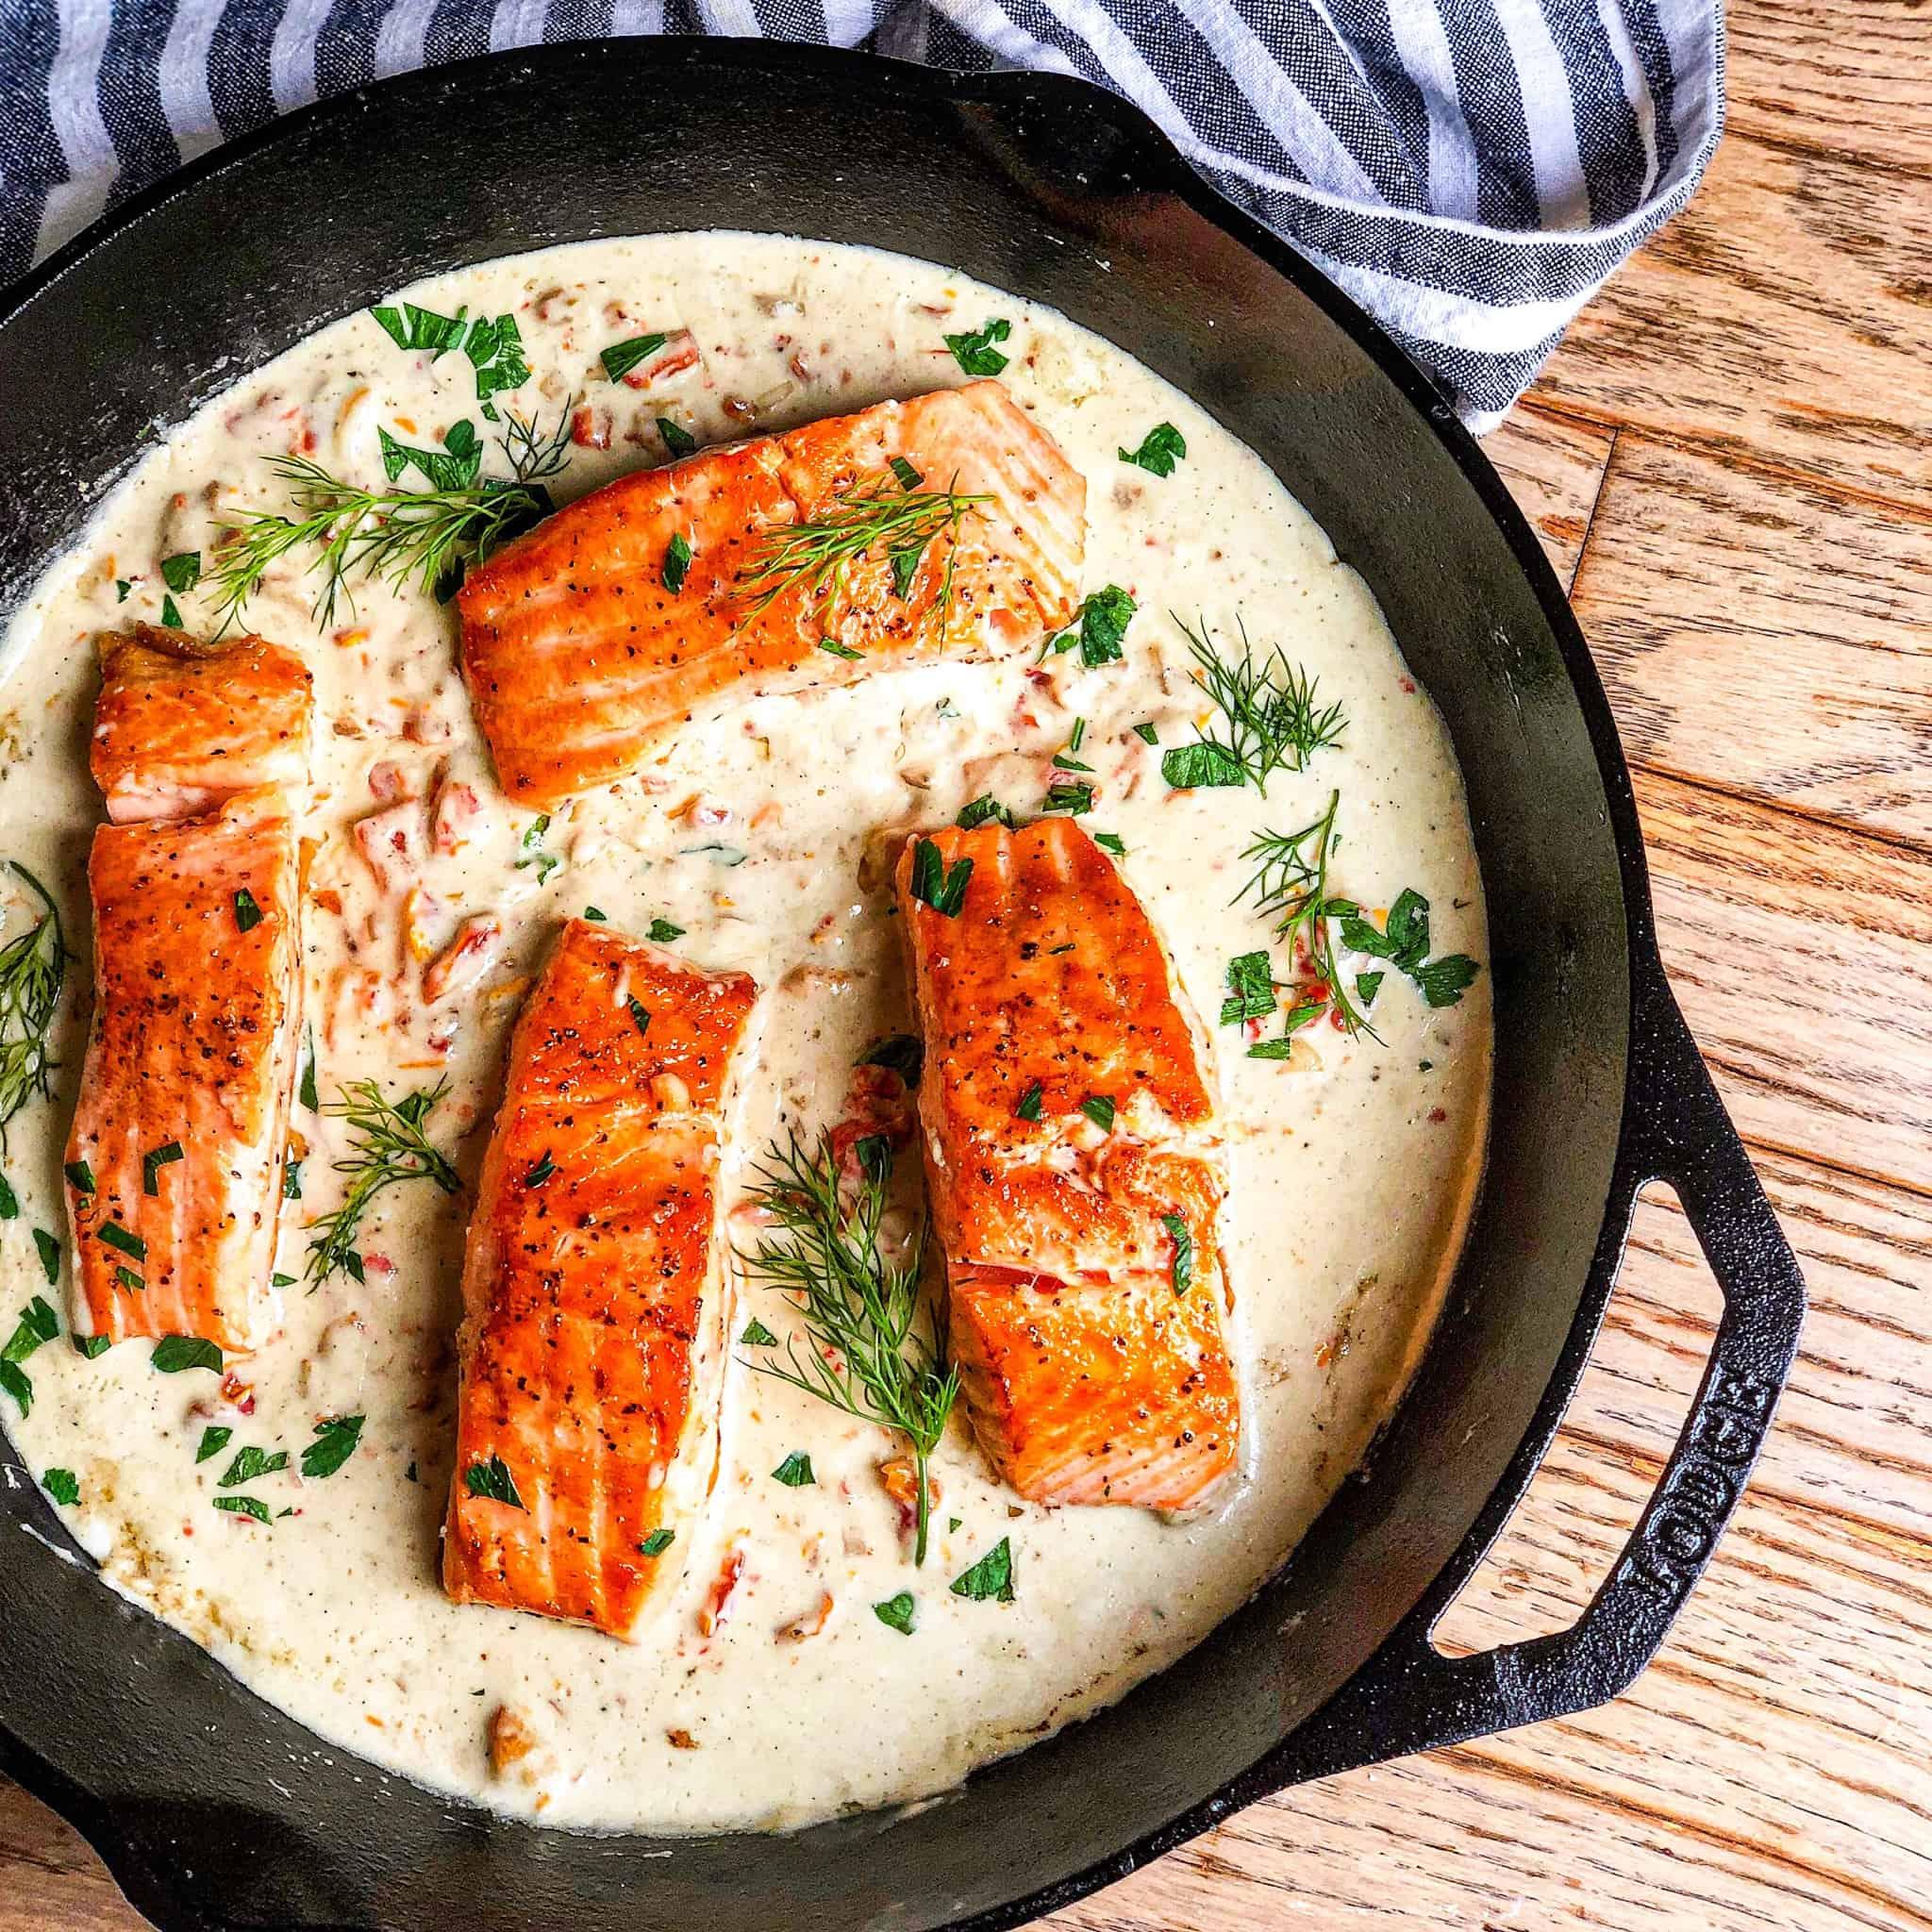 Seared Salmon in Lemon Dill Cream Sauce